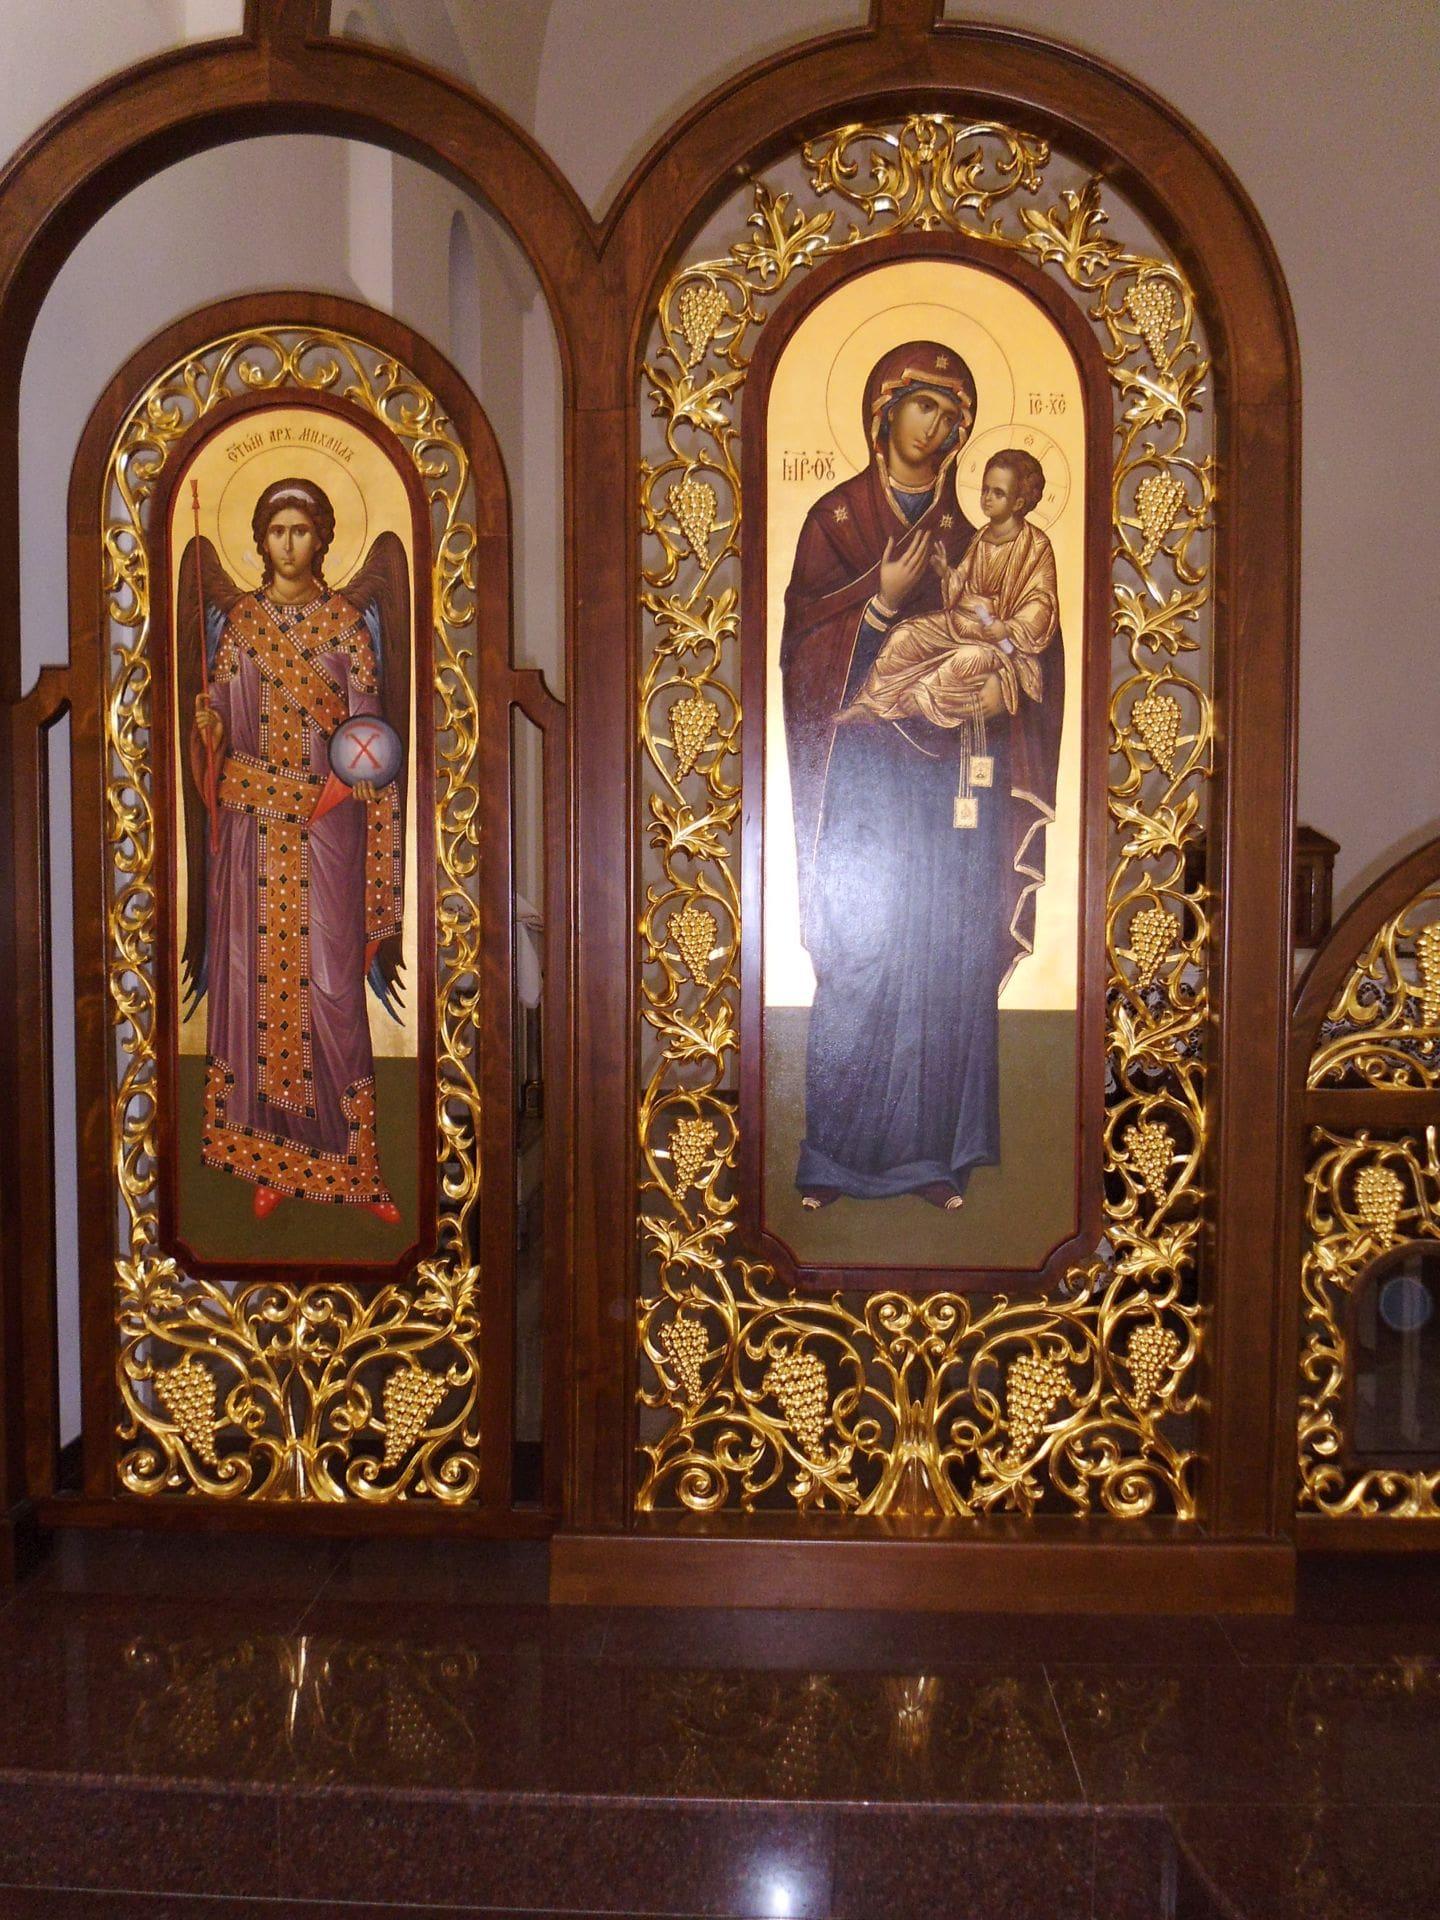 Манастир Свети дух_иконостас фрагмент 2